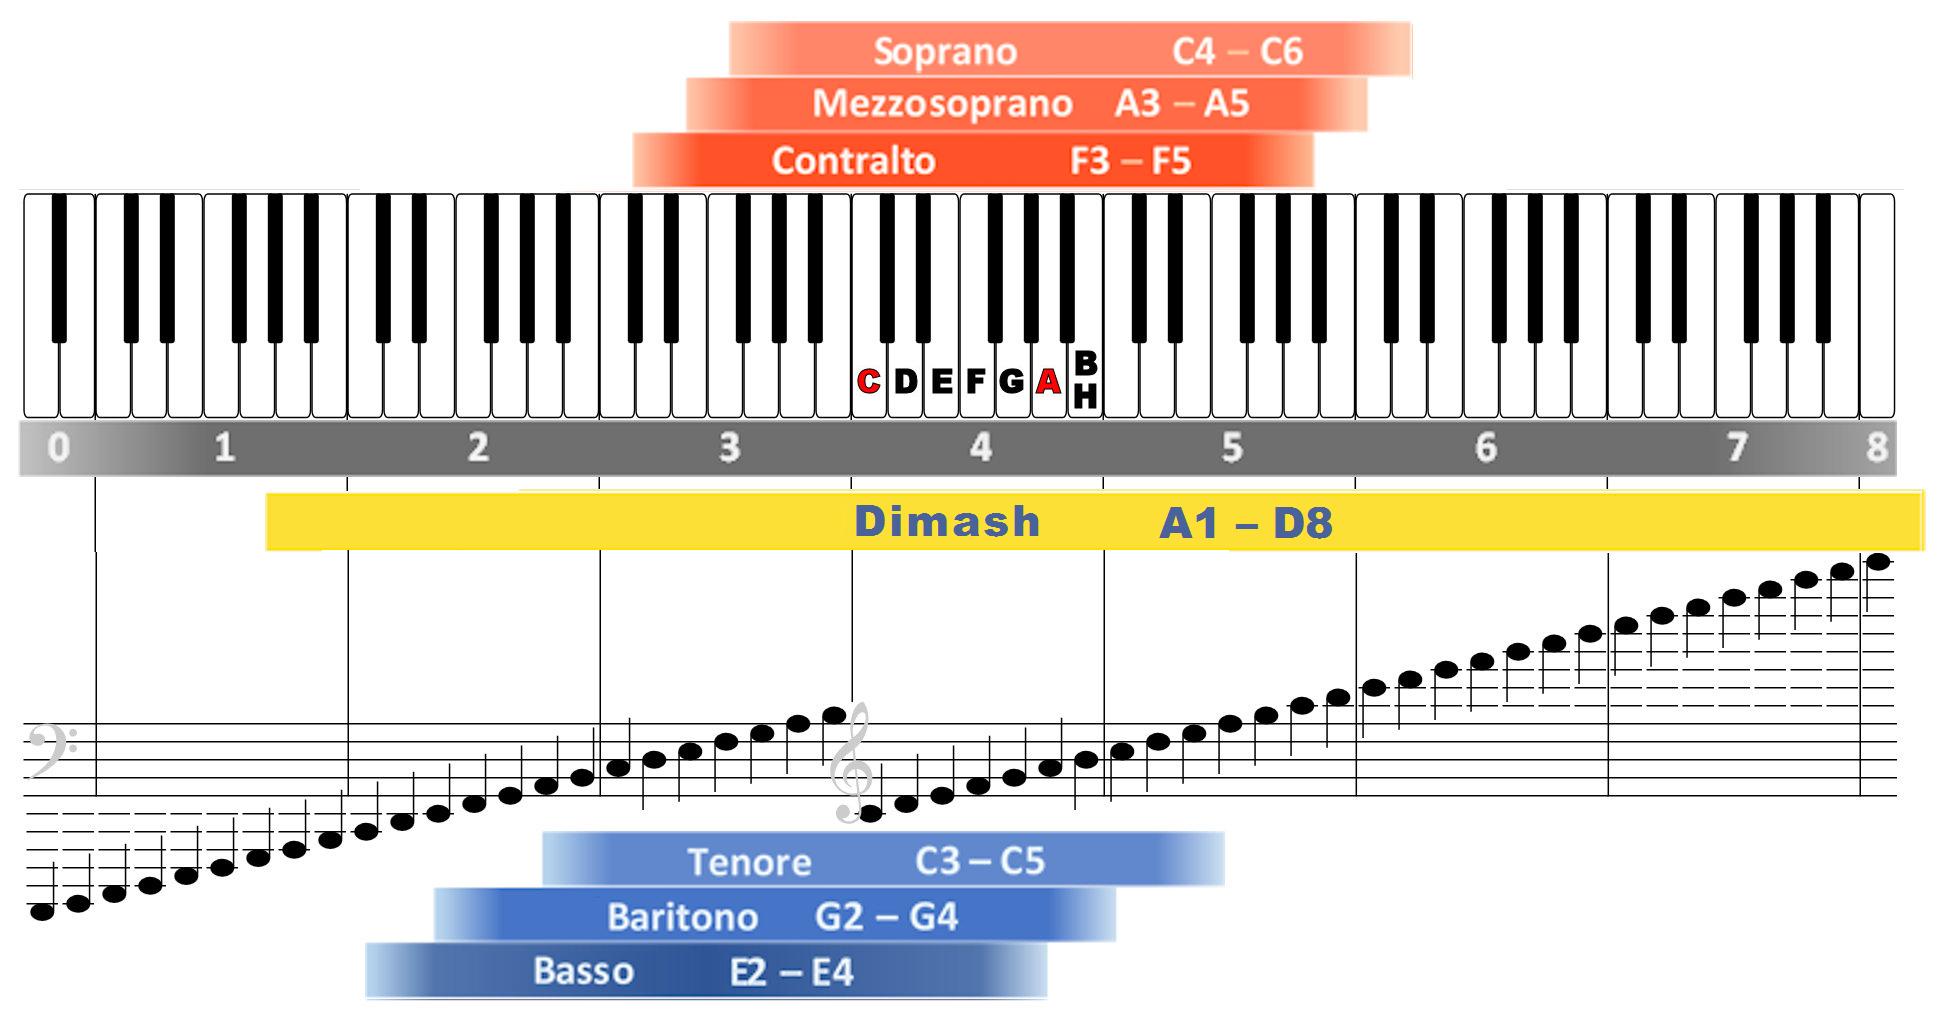 تحميل موسيقى بيانو وكمان mp3